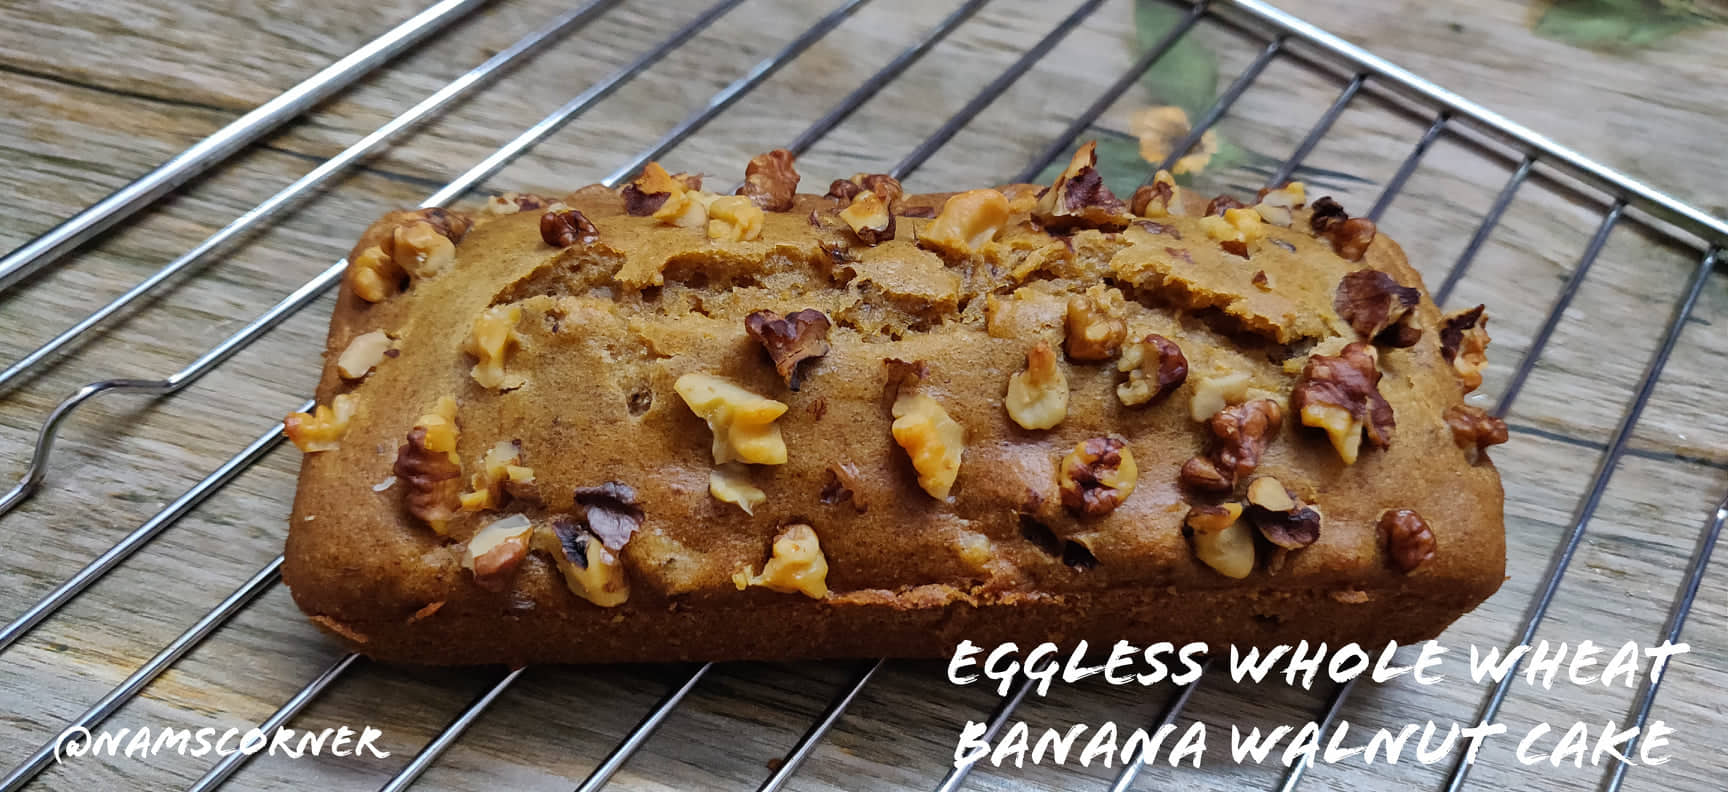 Whole Wheat Banana Walnut Cake Recipe | Eggless Banana Walnut Cake